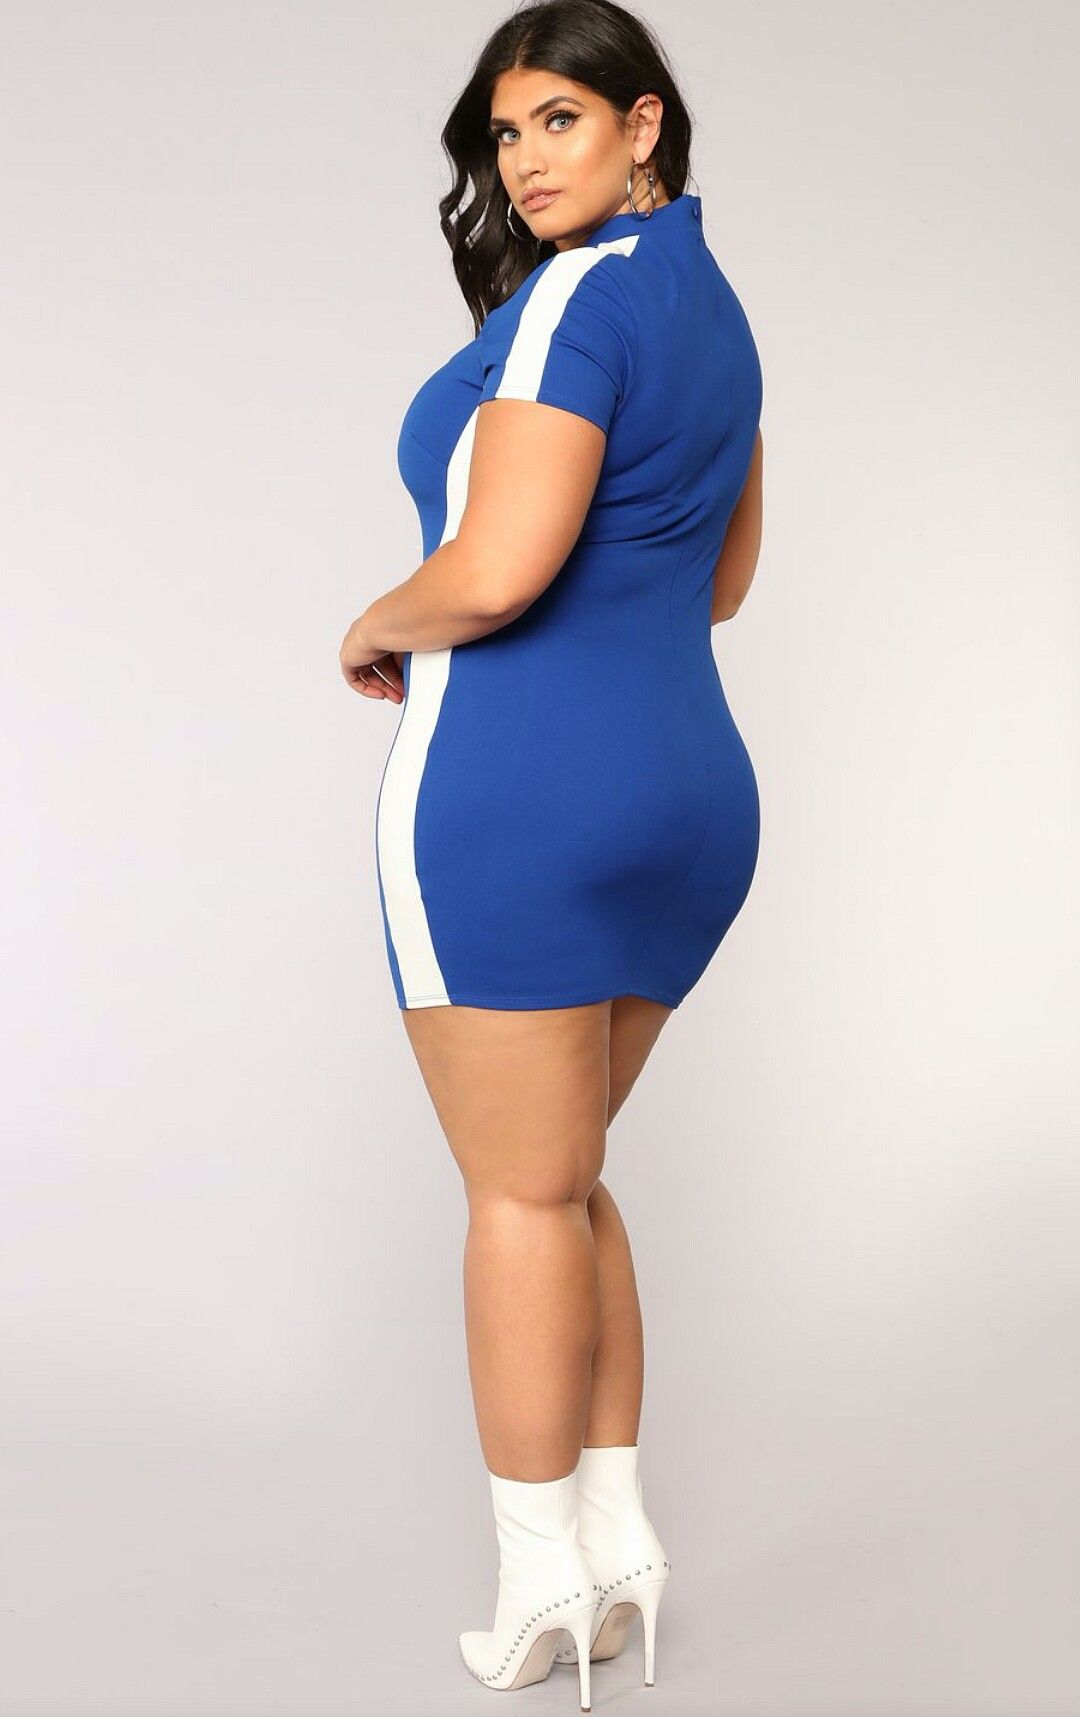 90716fddf2689 Latecia Thomas Curvy Women Fashion